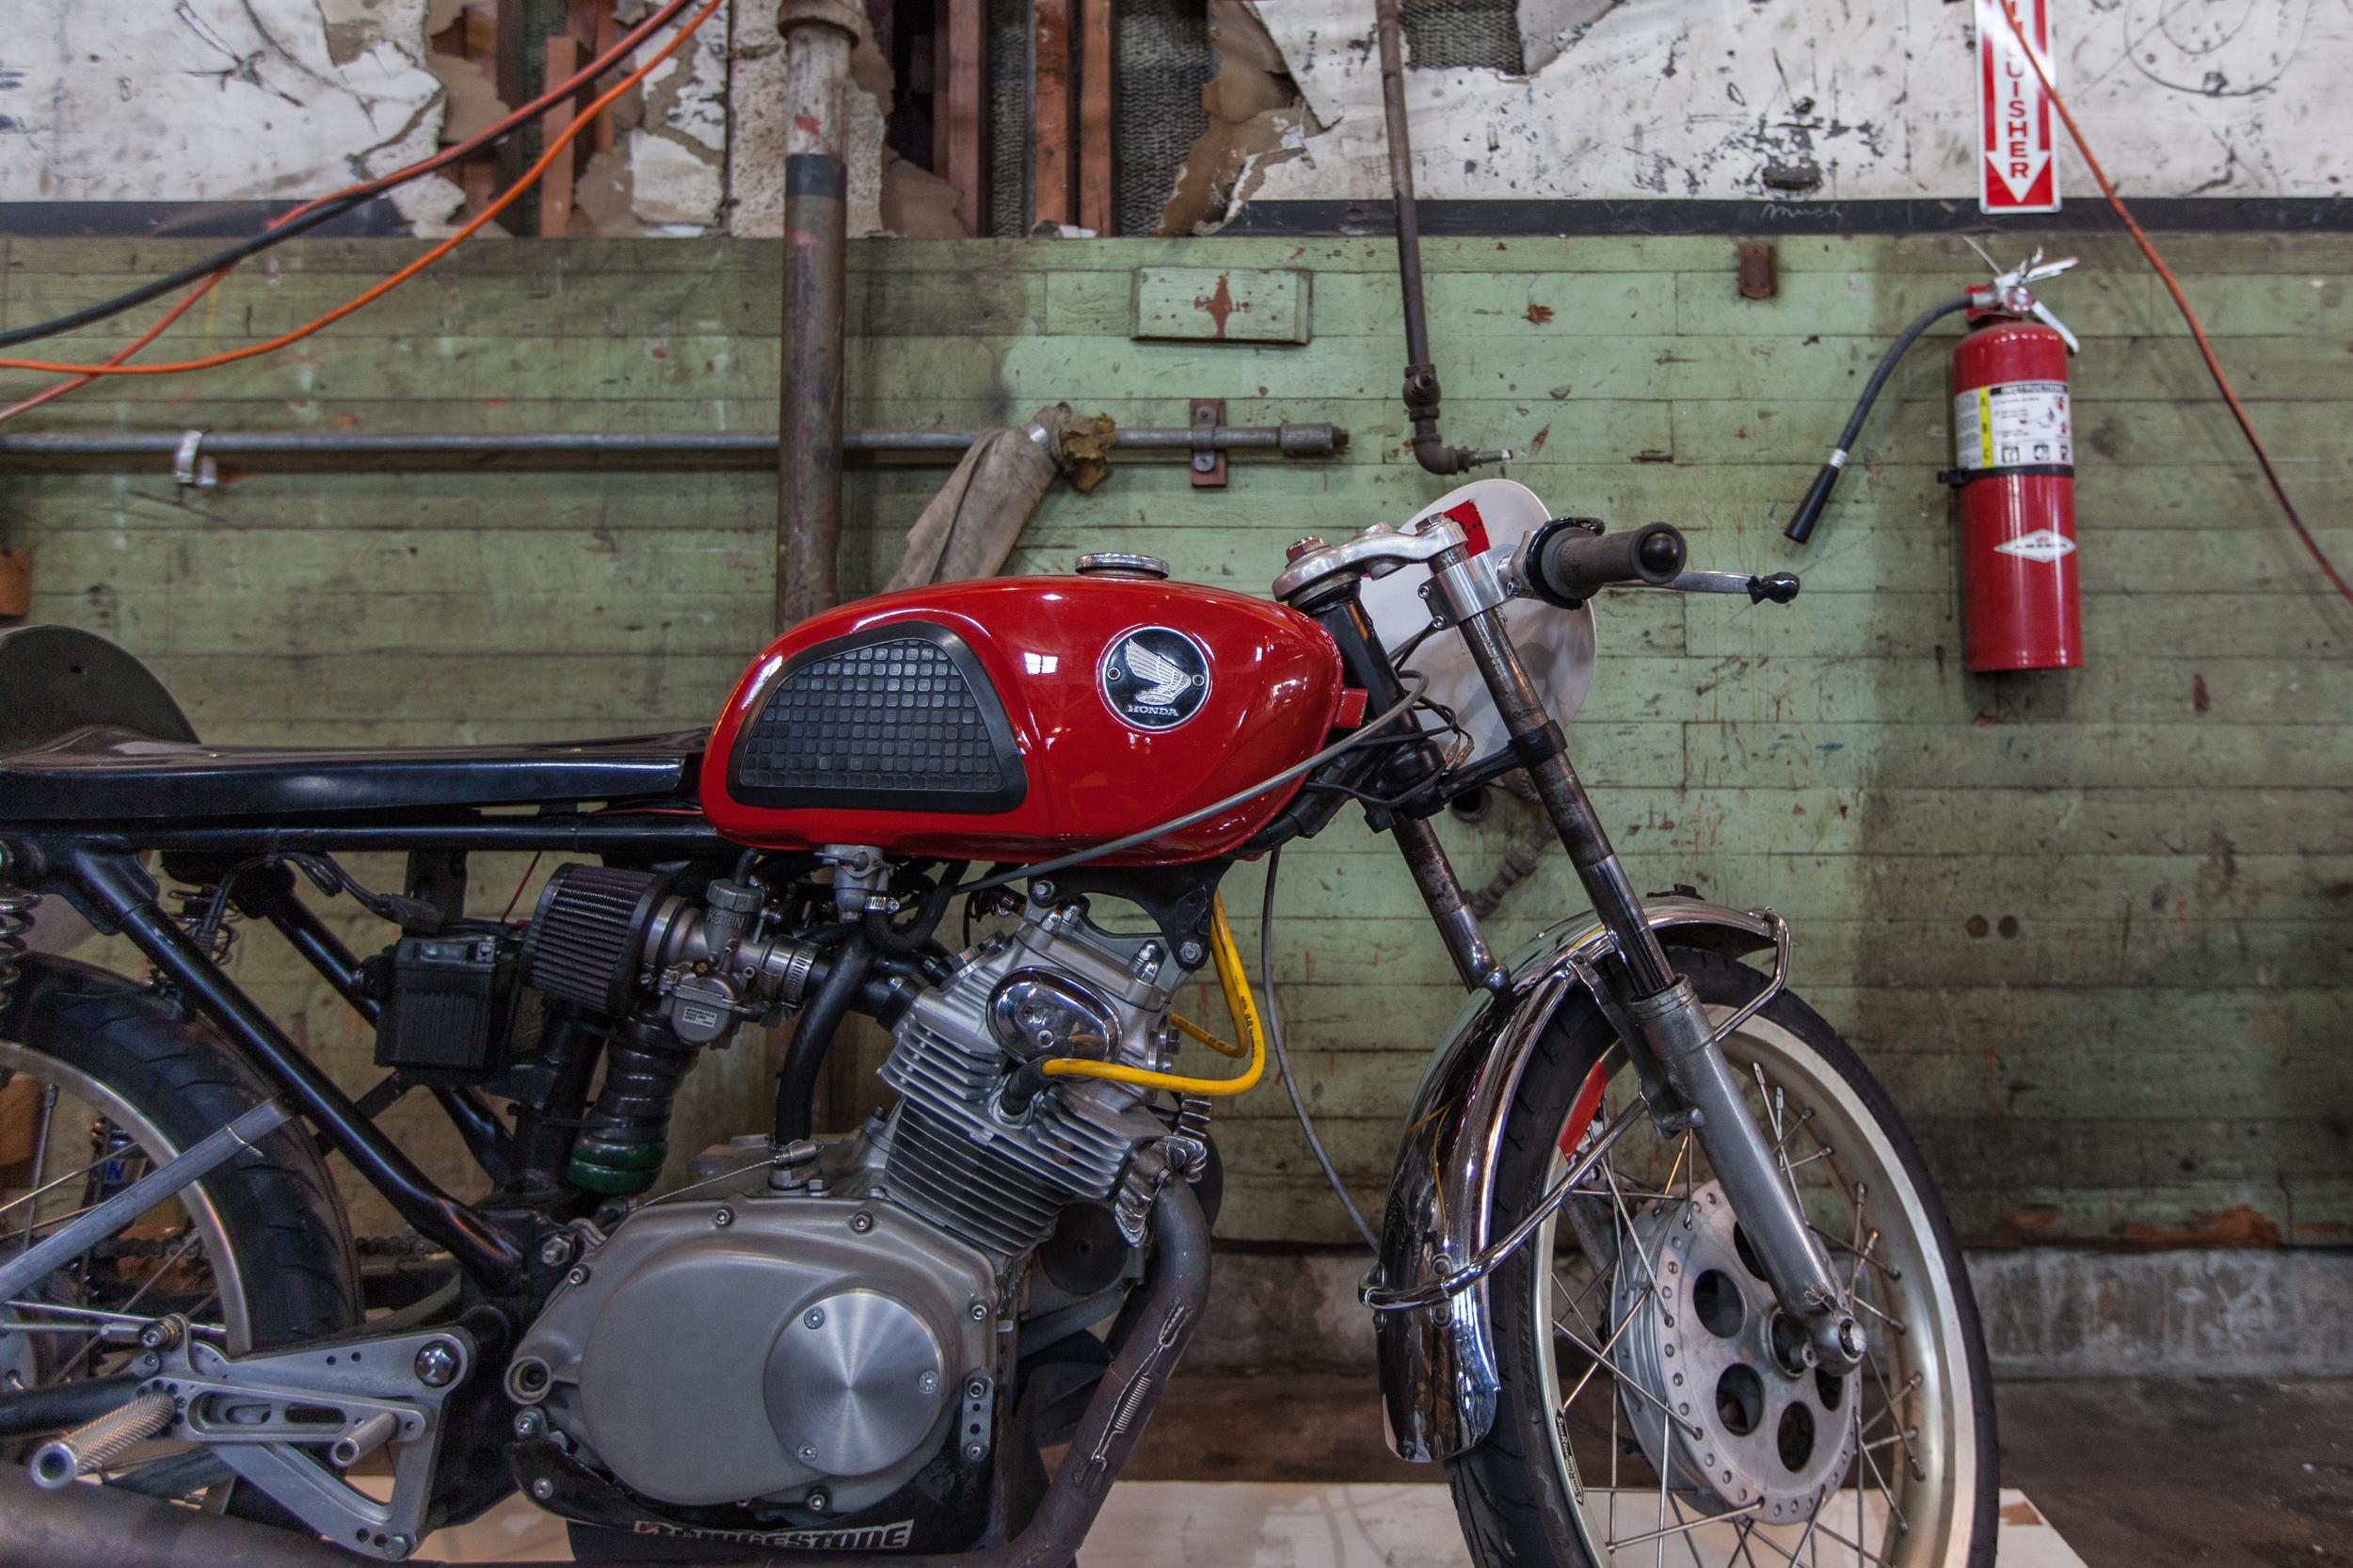 02-14-15 The 1 Moto Show - 4-114-18.jpg